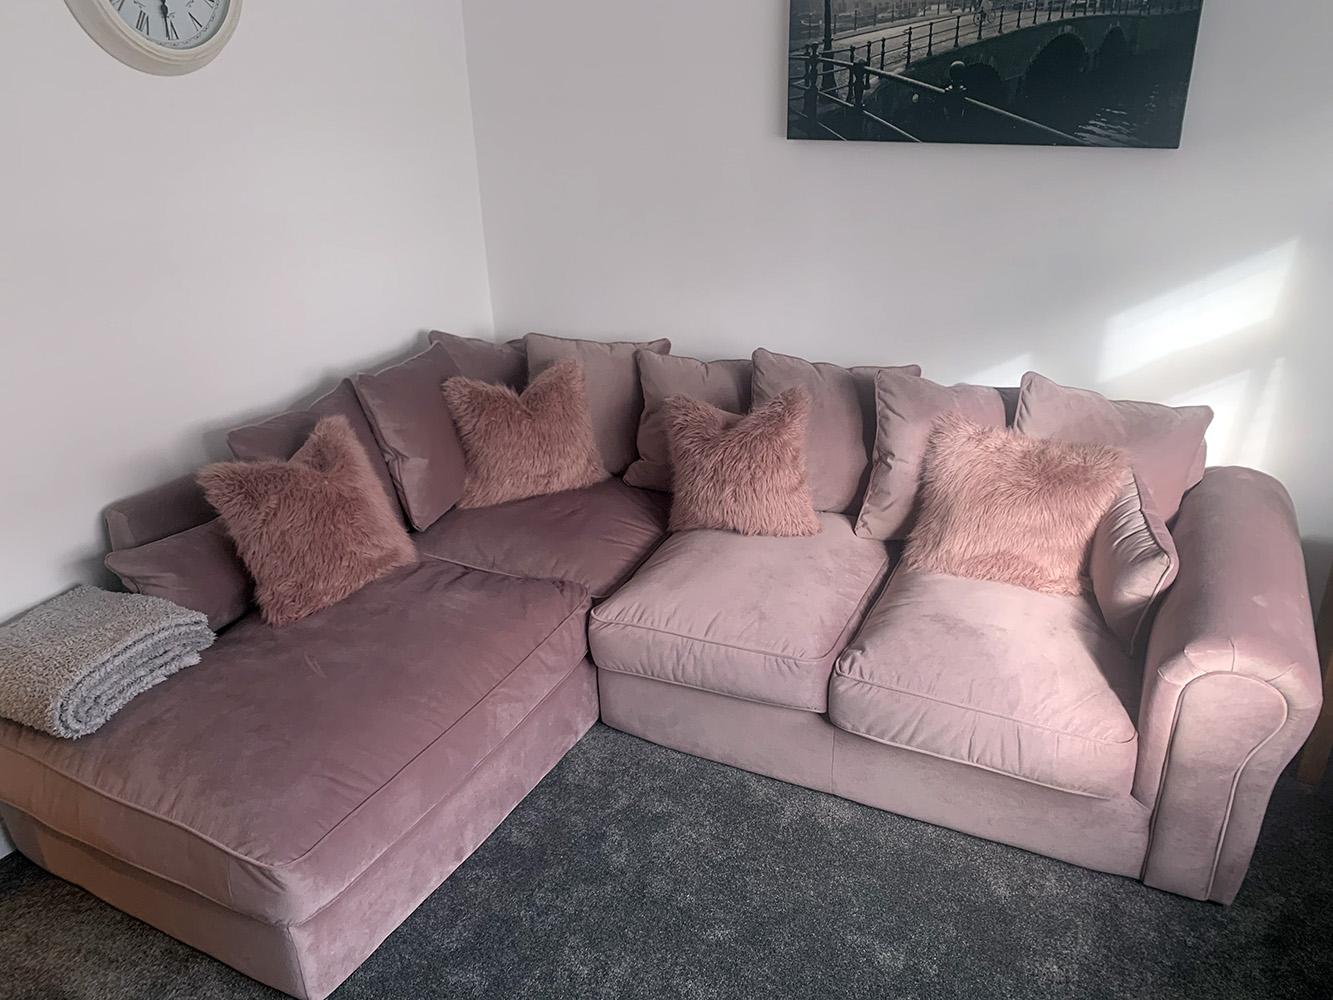 Baron velour corner sofa in powder pink from Emily